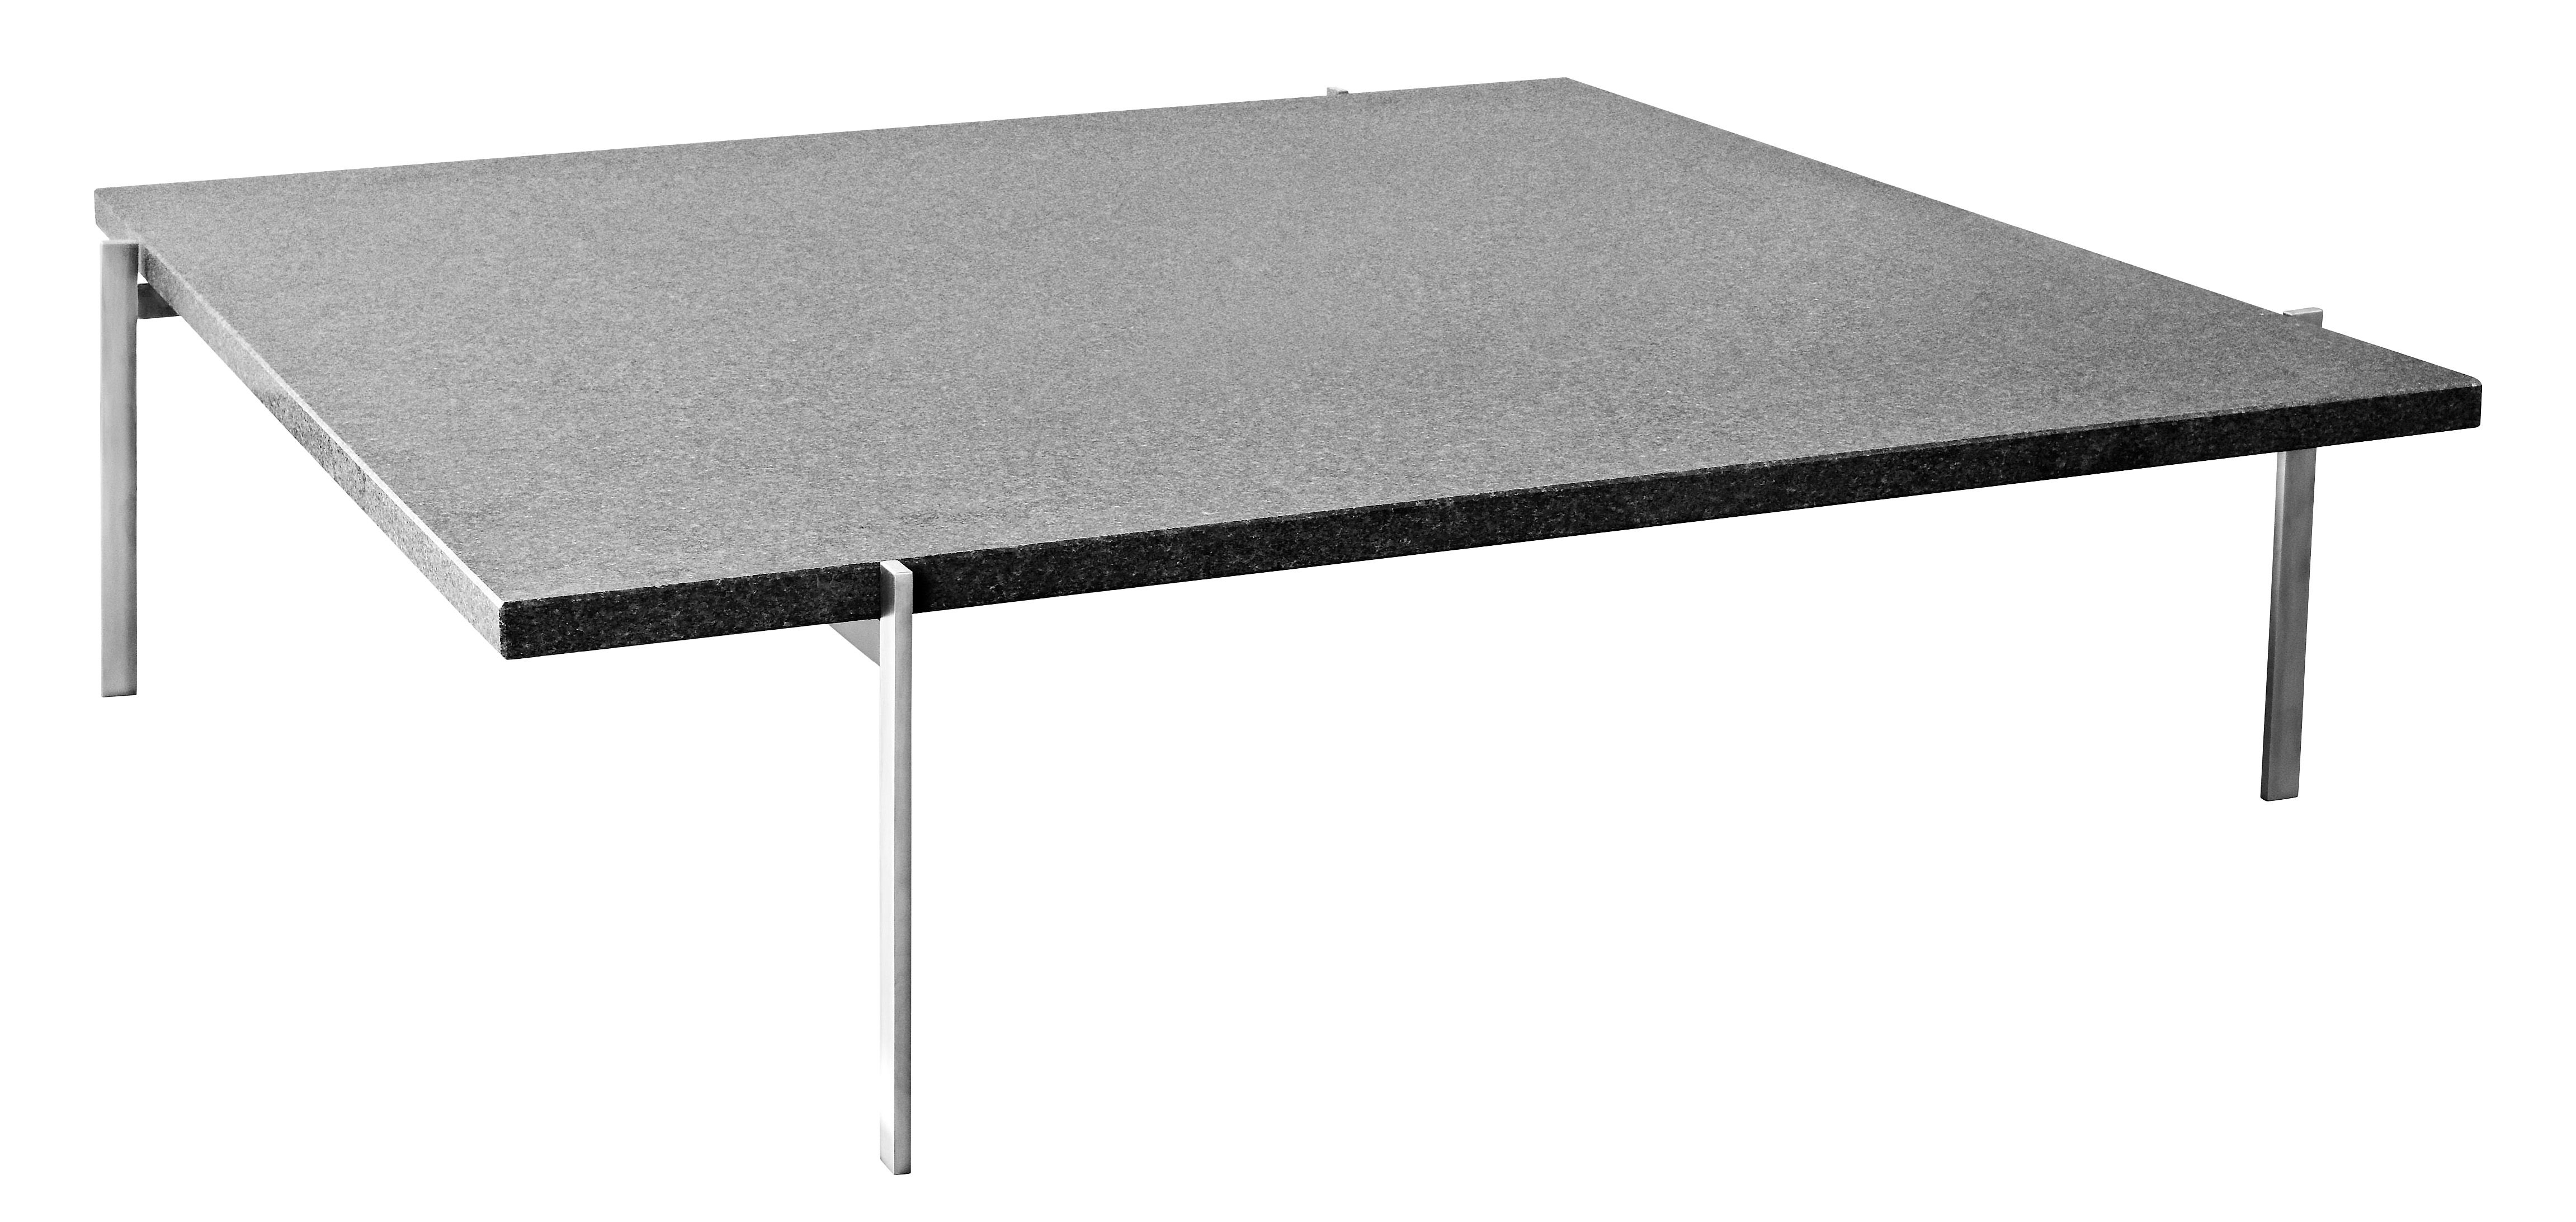 pk 61 80 x 80 cm fritz hansen couchtisch. Black Bedroom Furniture Sets. Home Design Ideas